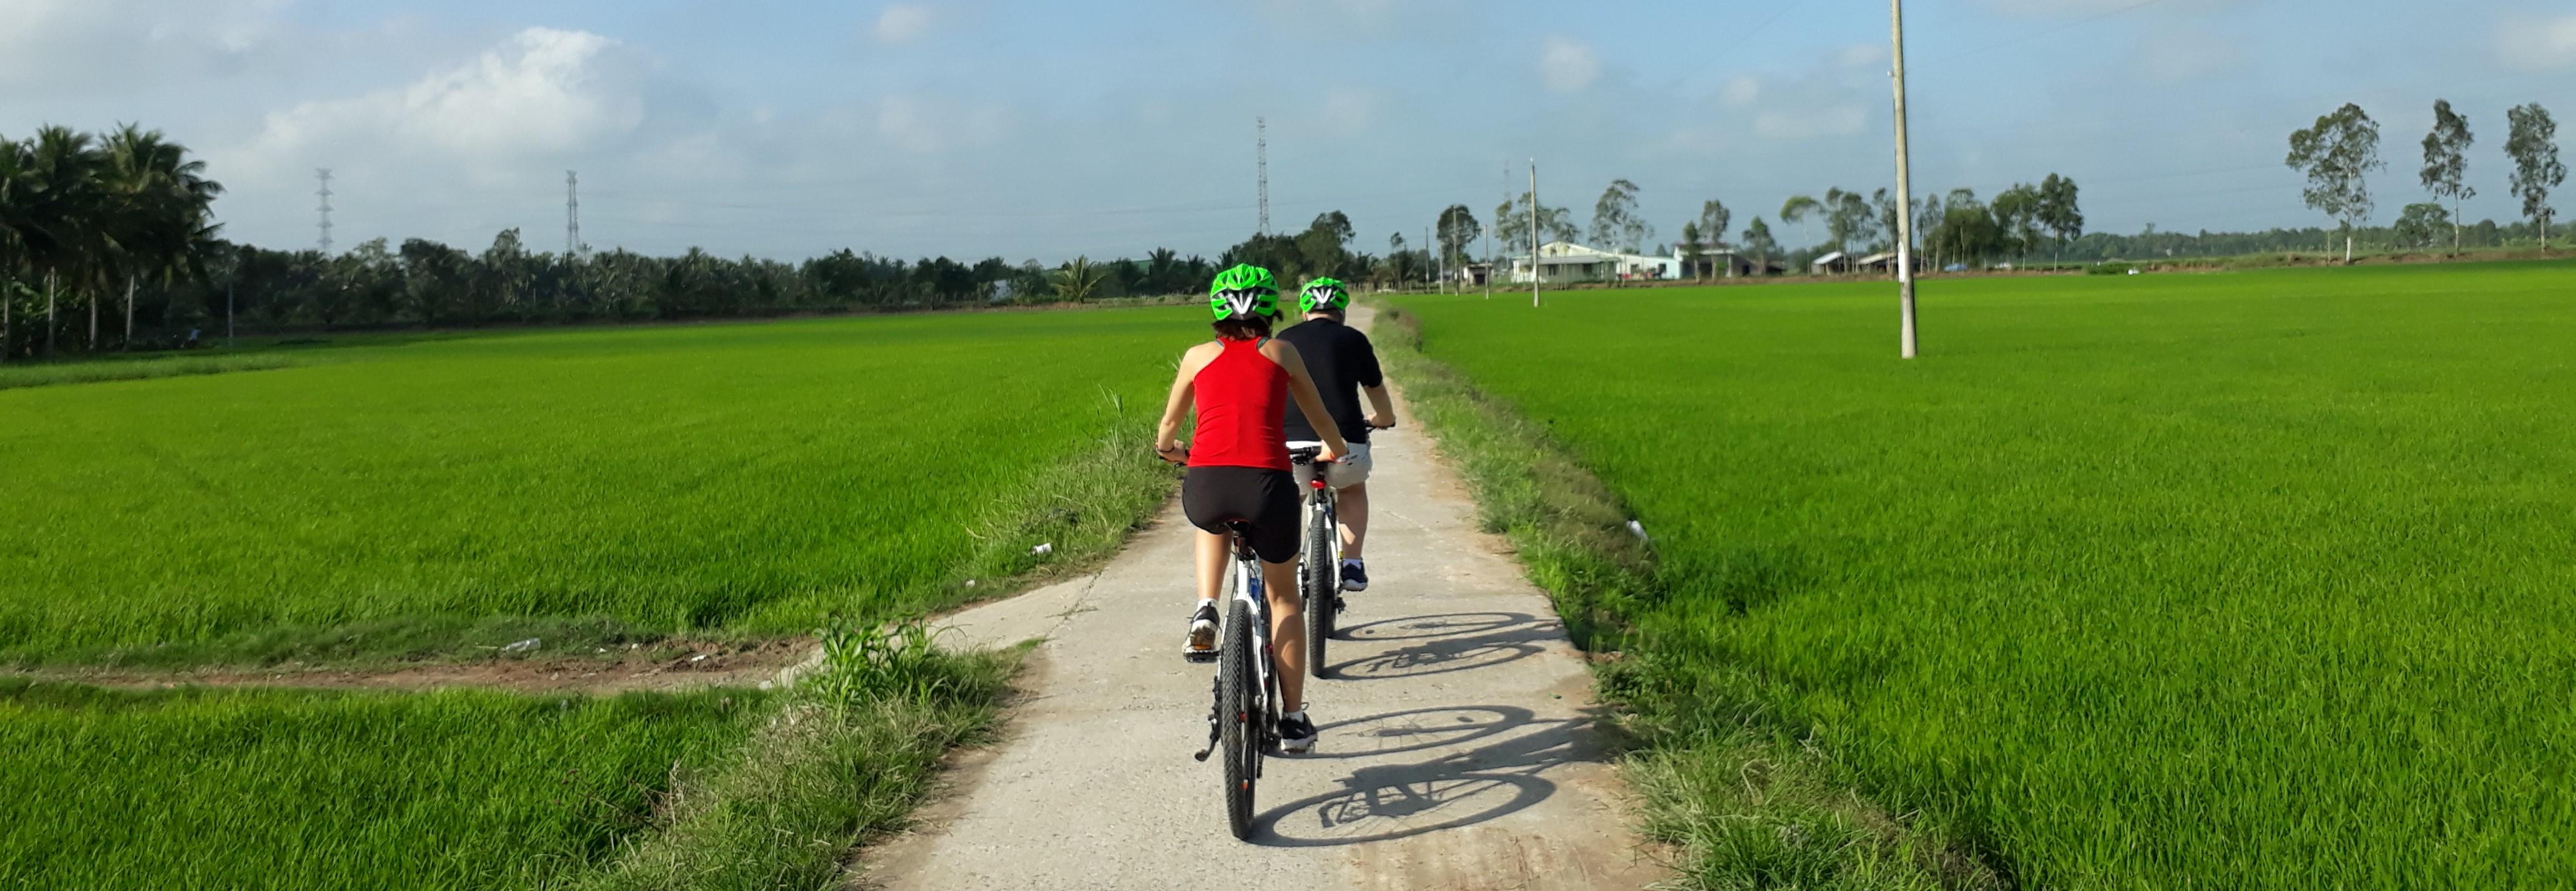 SAIGON – CUCHI TUNNELS BY BIKE DAY TRIP